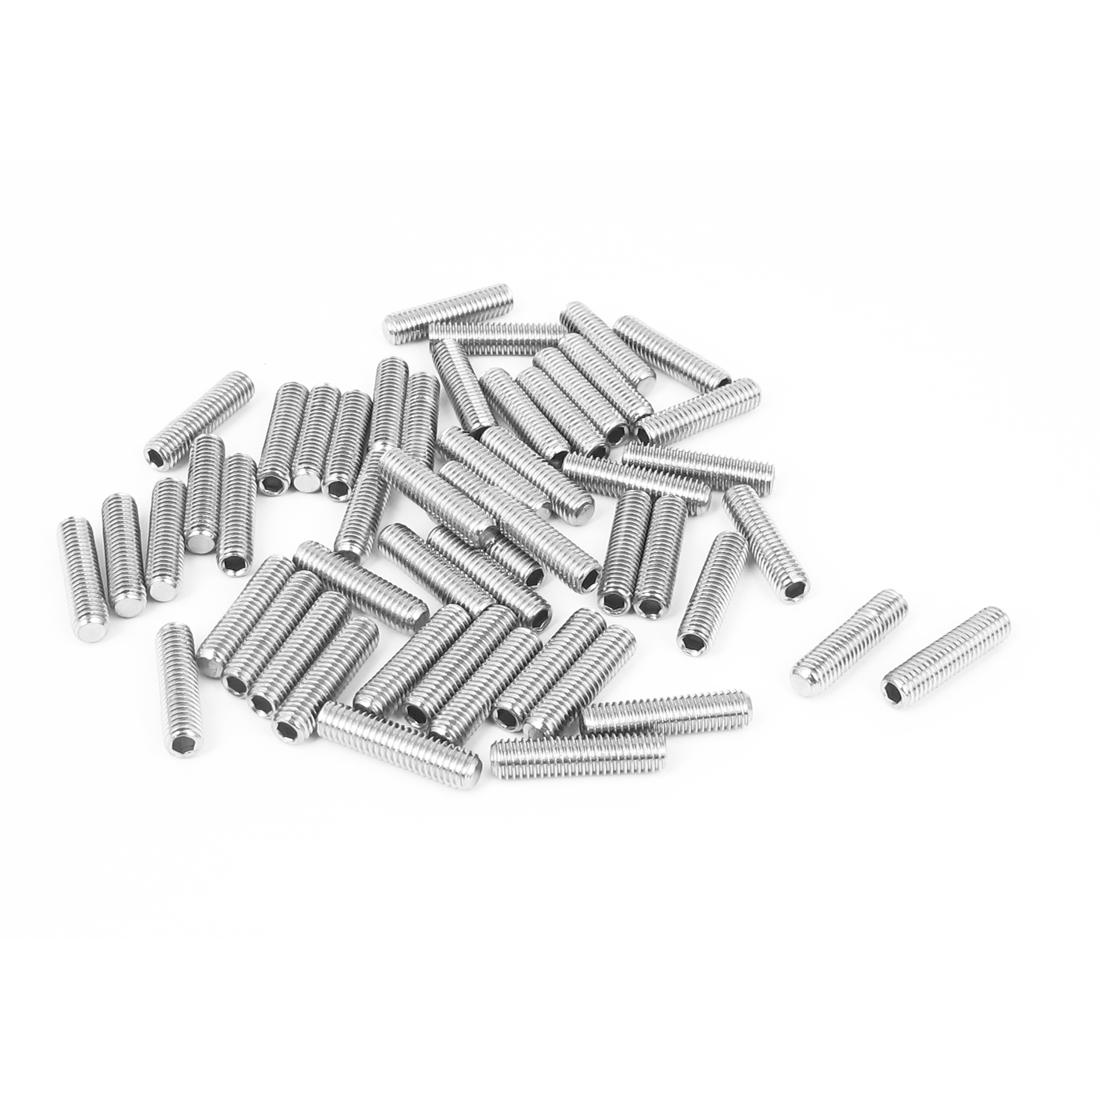 M5x20mm Stainless Steel Hex Socket Set Cap Point Grub Screws Silver Tone 50pcs